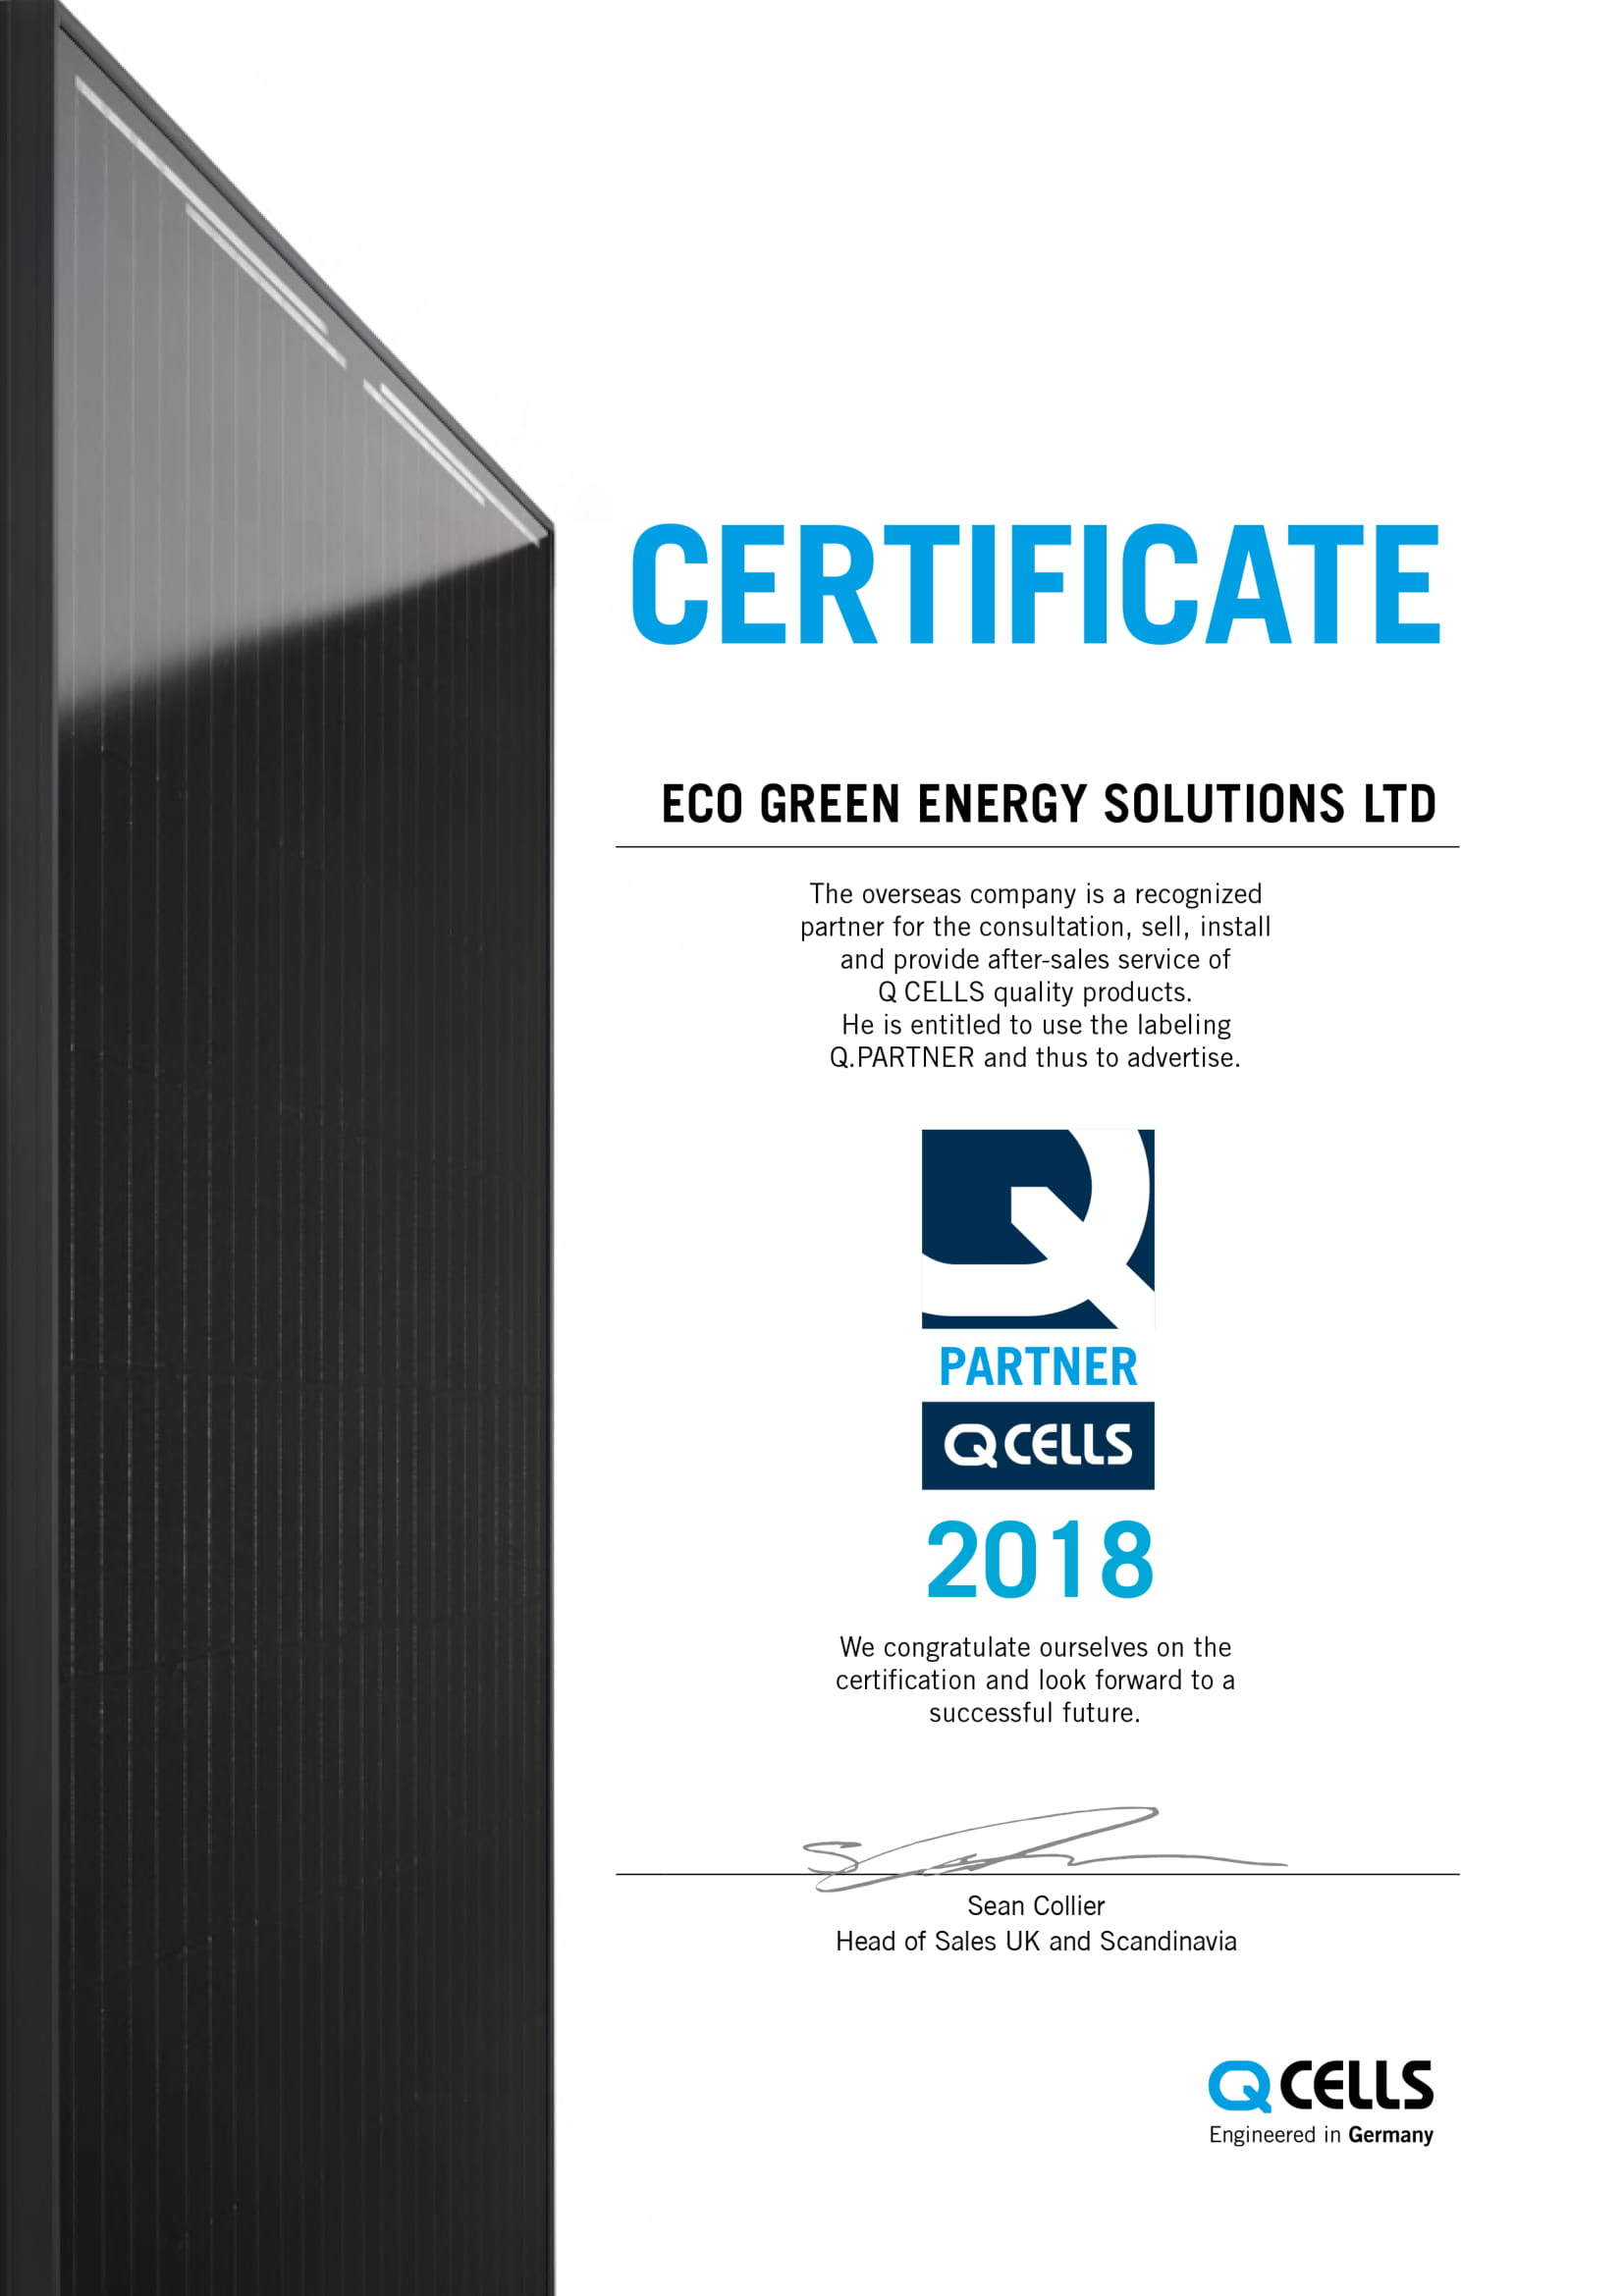 QPartner Certificate 1